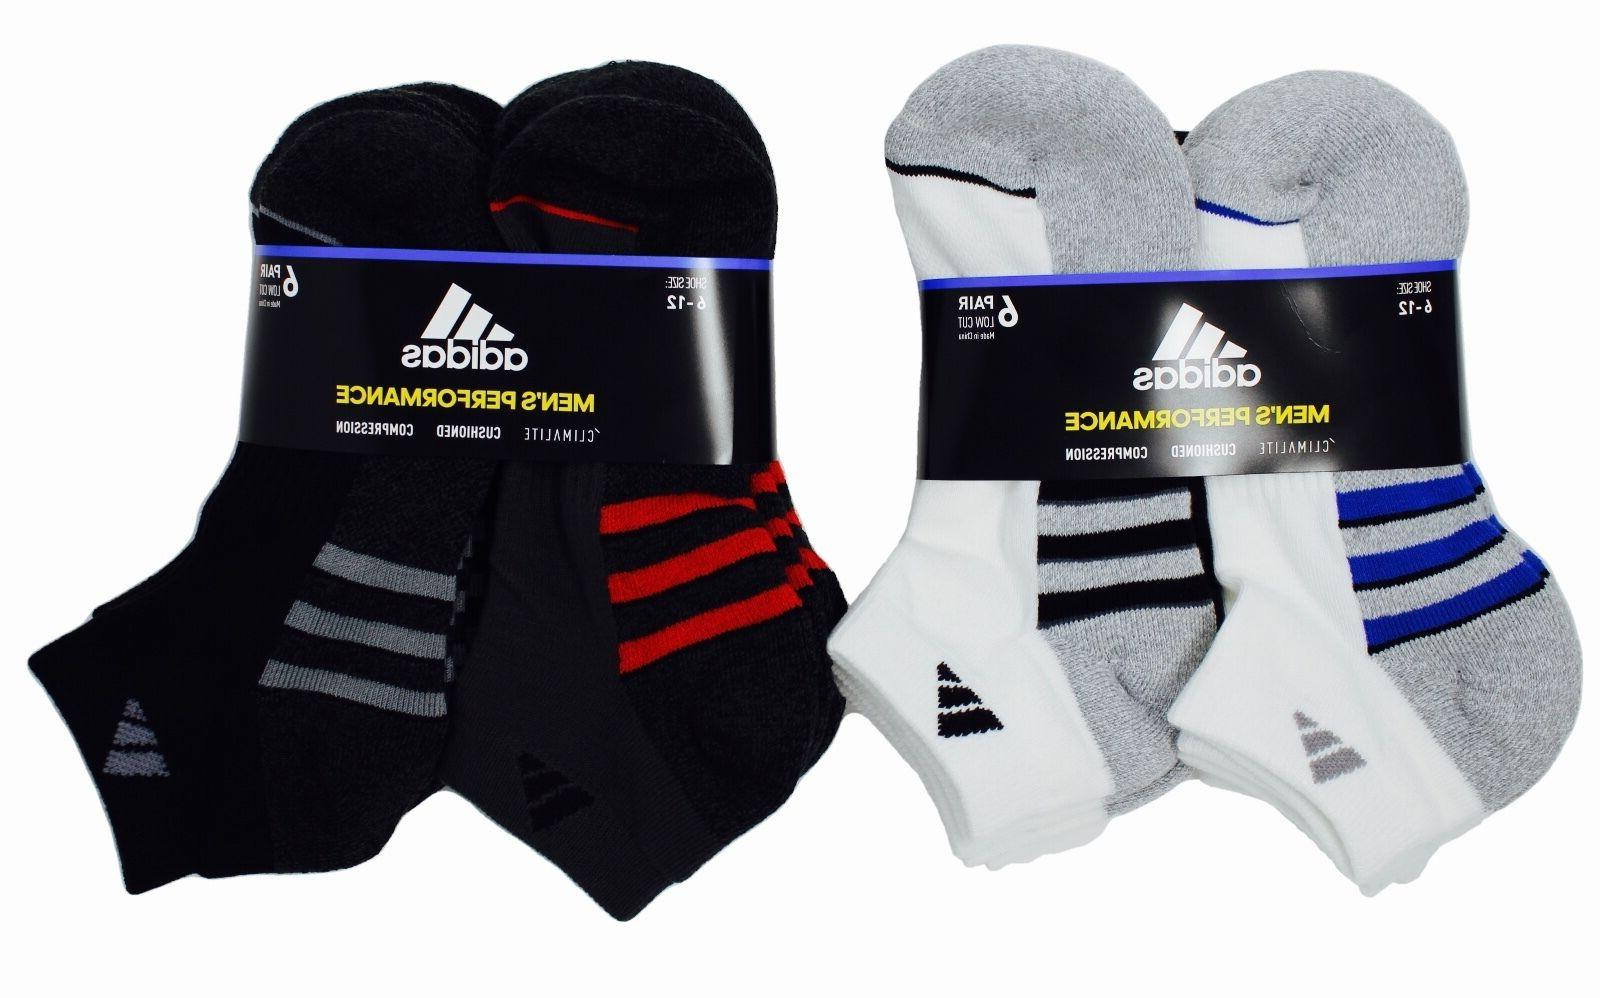 Adidas Men's Low Cut Socks Performance Climalite Cushioned,